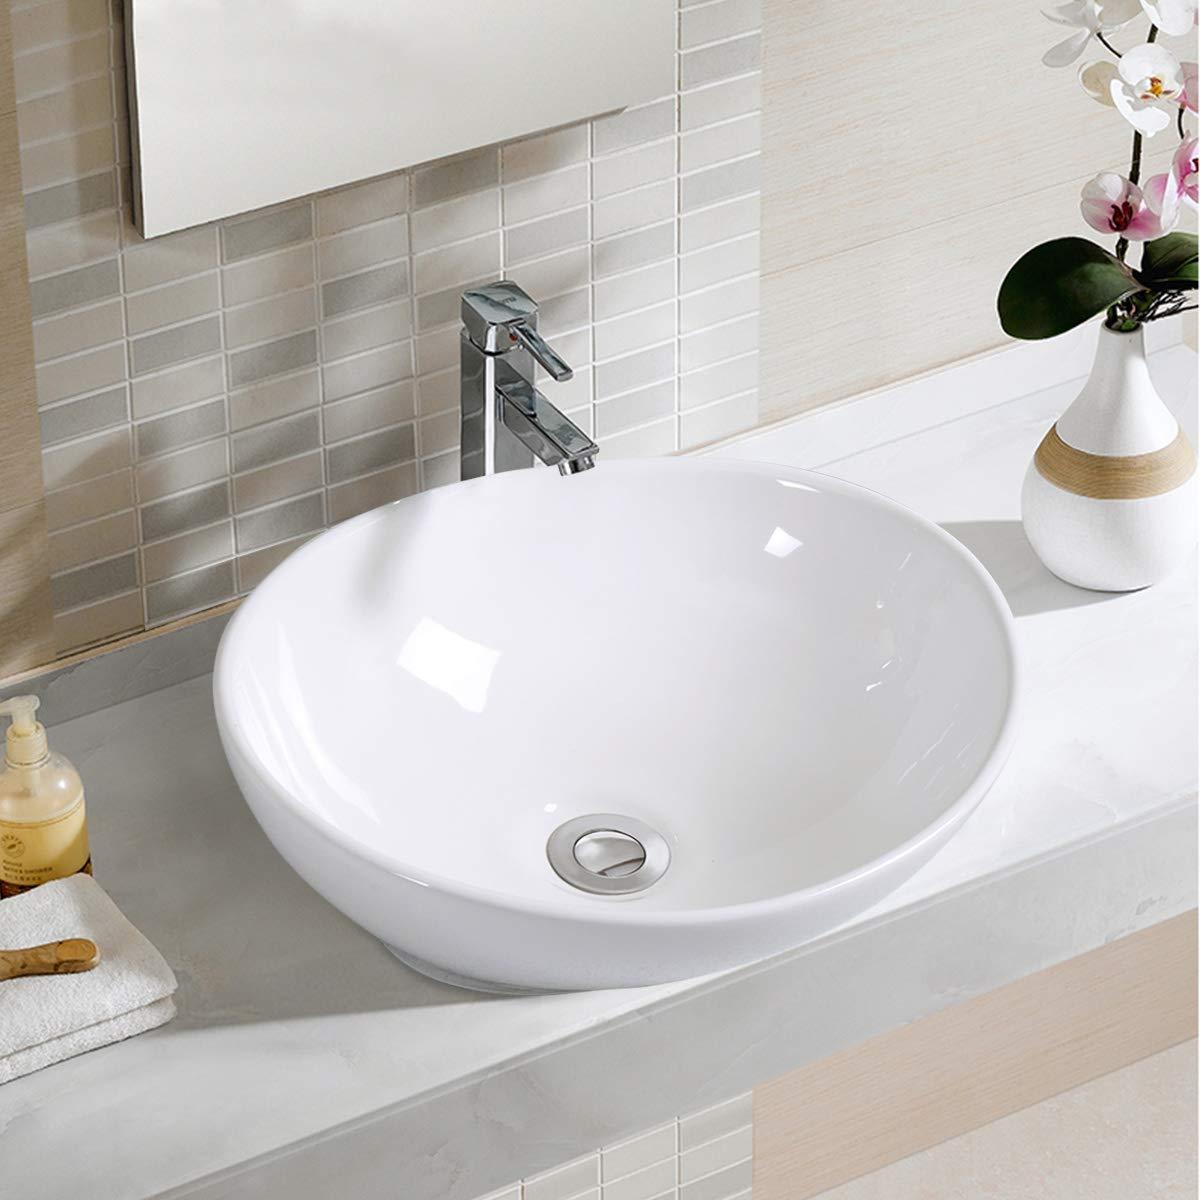 . Giantex Oval Bathroom Basin Ceramic Vessel Sink Bowl Vanity Porcelain w Pop  Up Drain